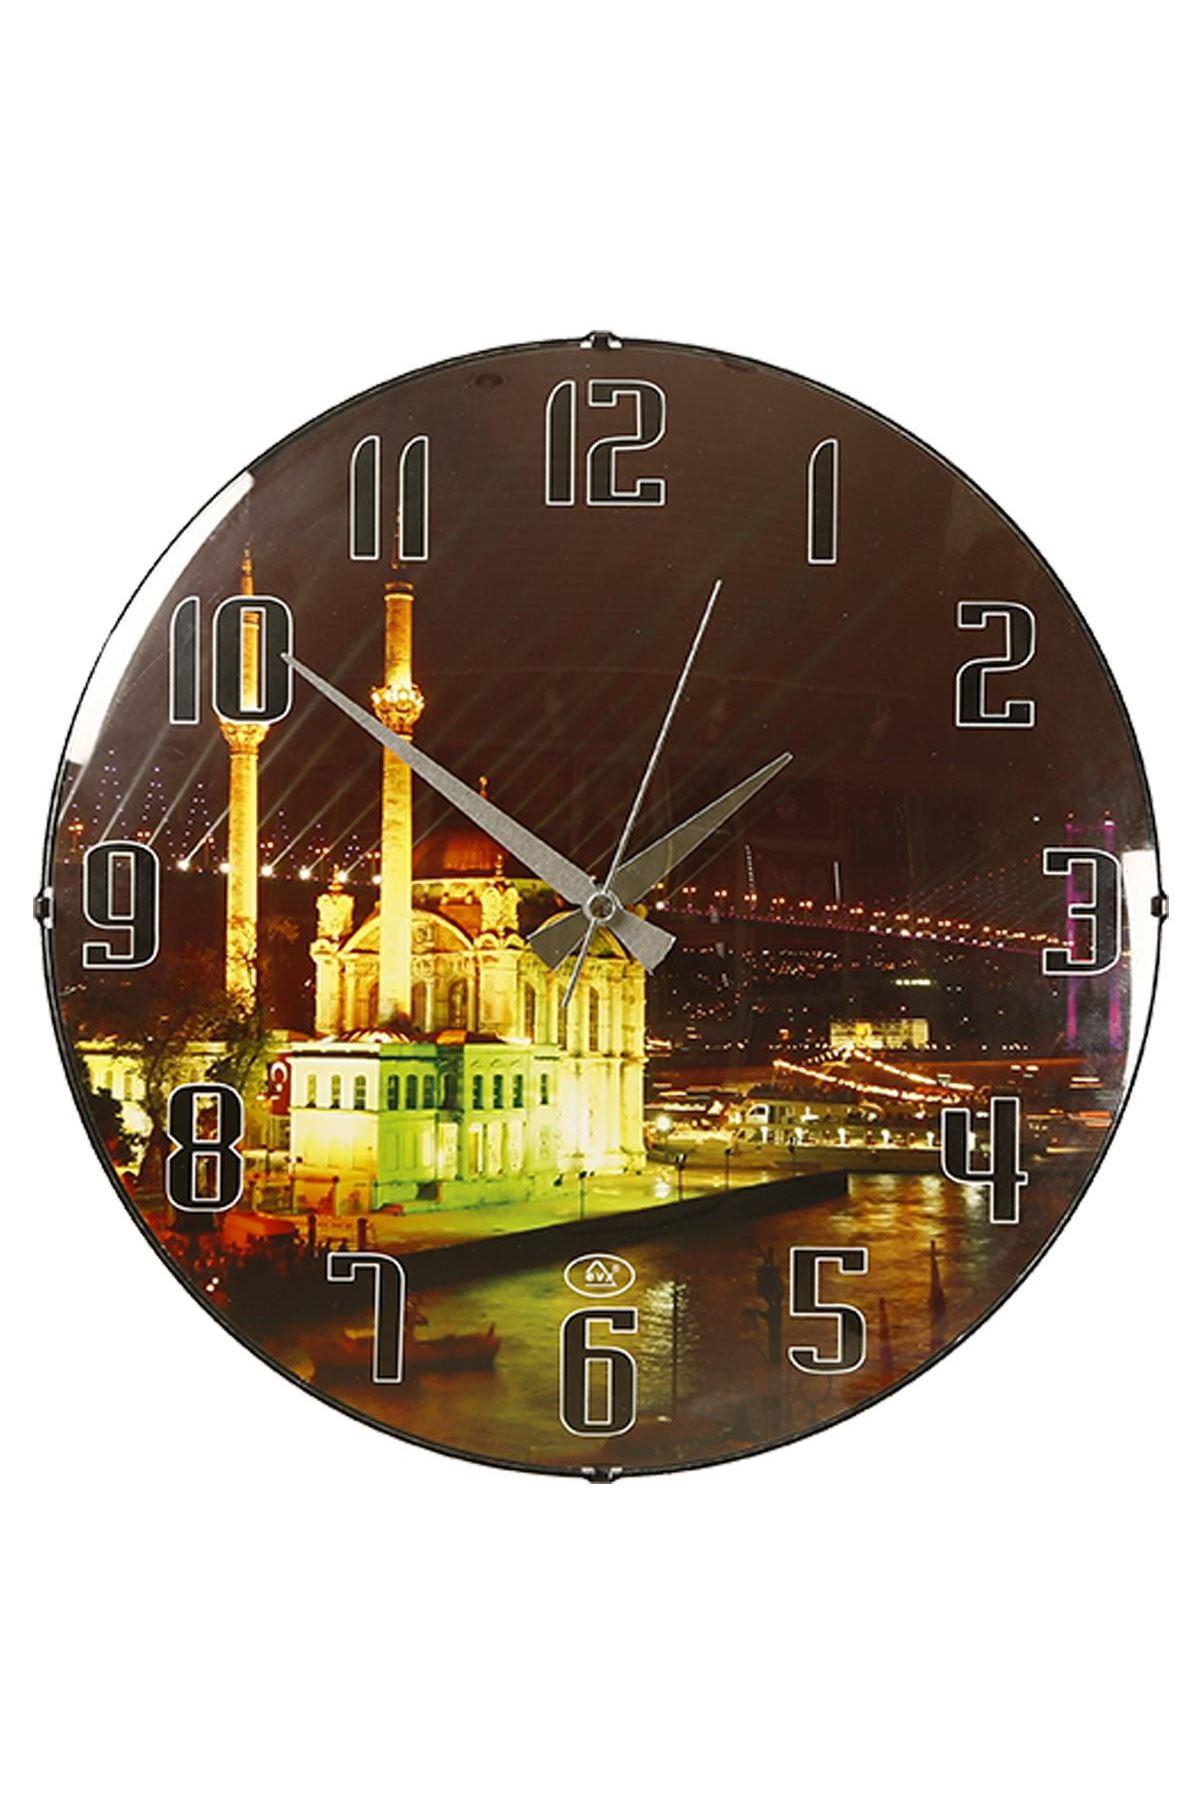 Rikon Ortaköy Cami Temalı Bombe Camlı Duvar Saati 35X35 Cm